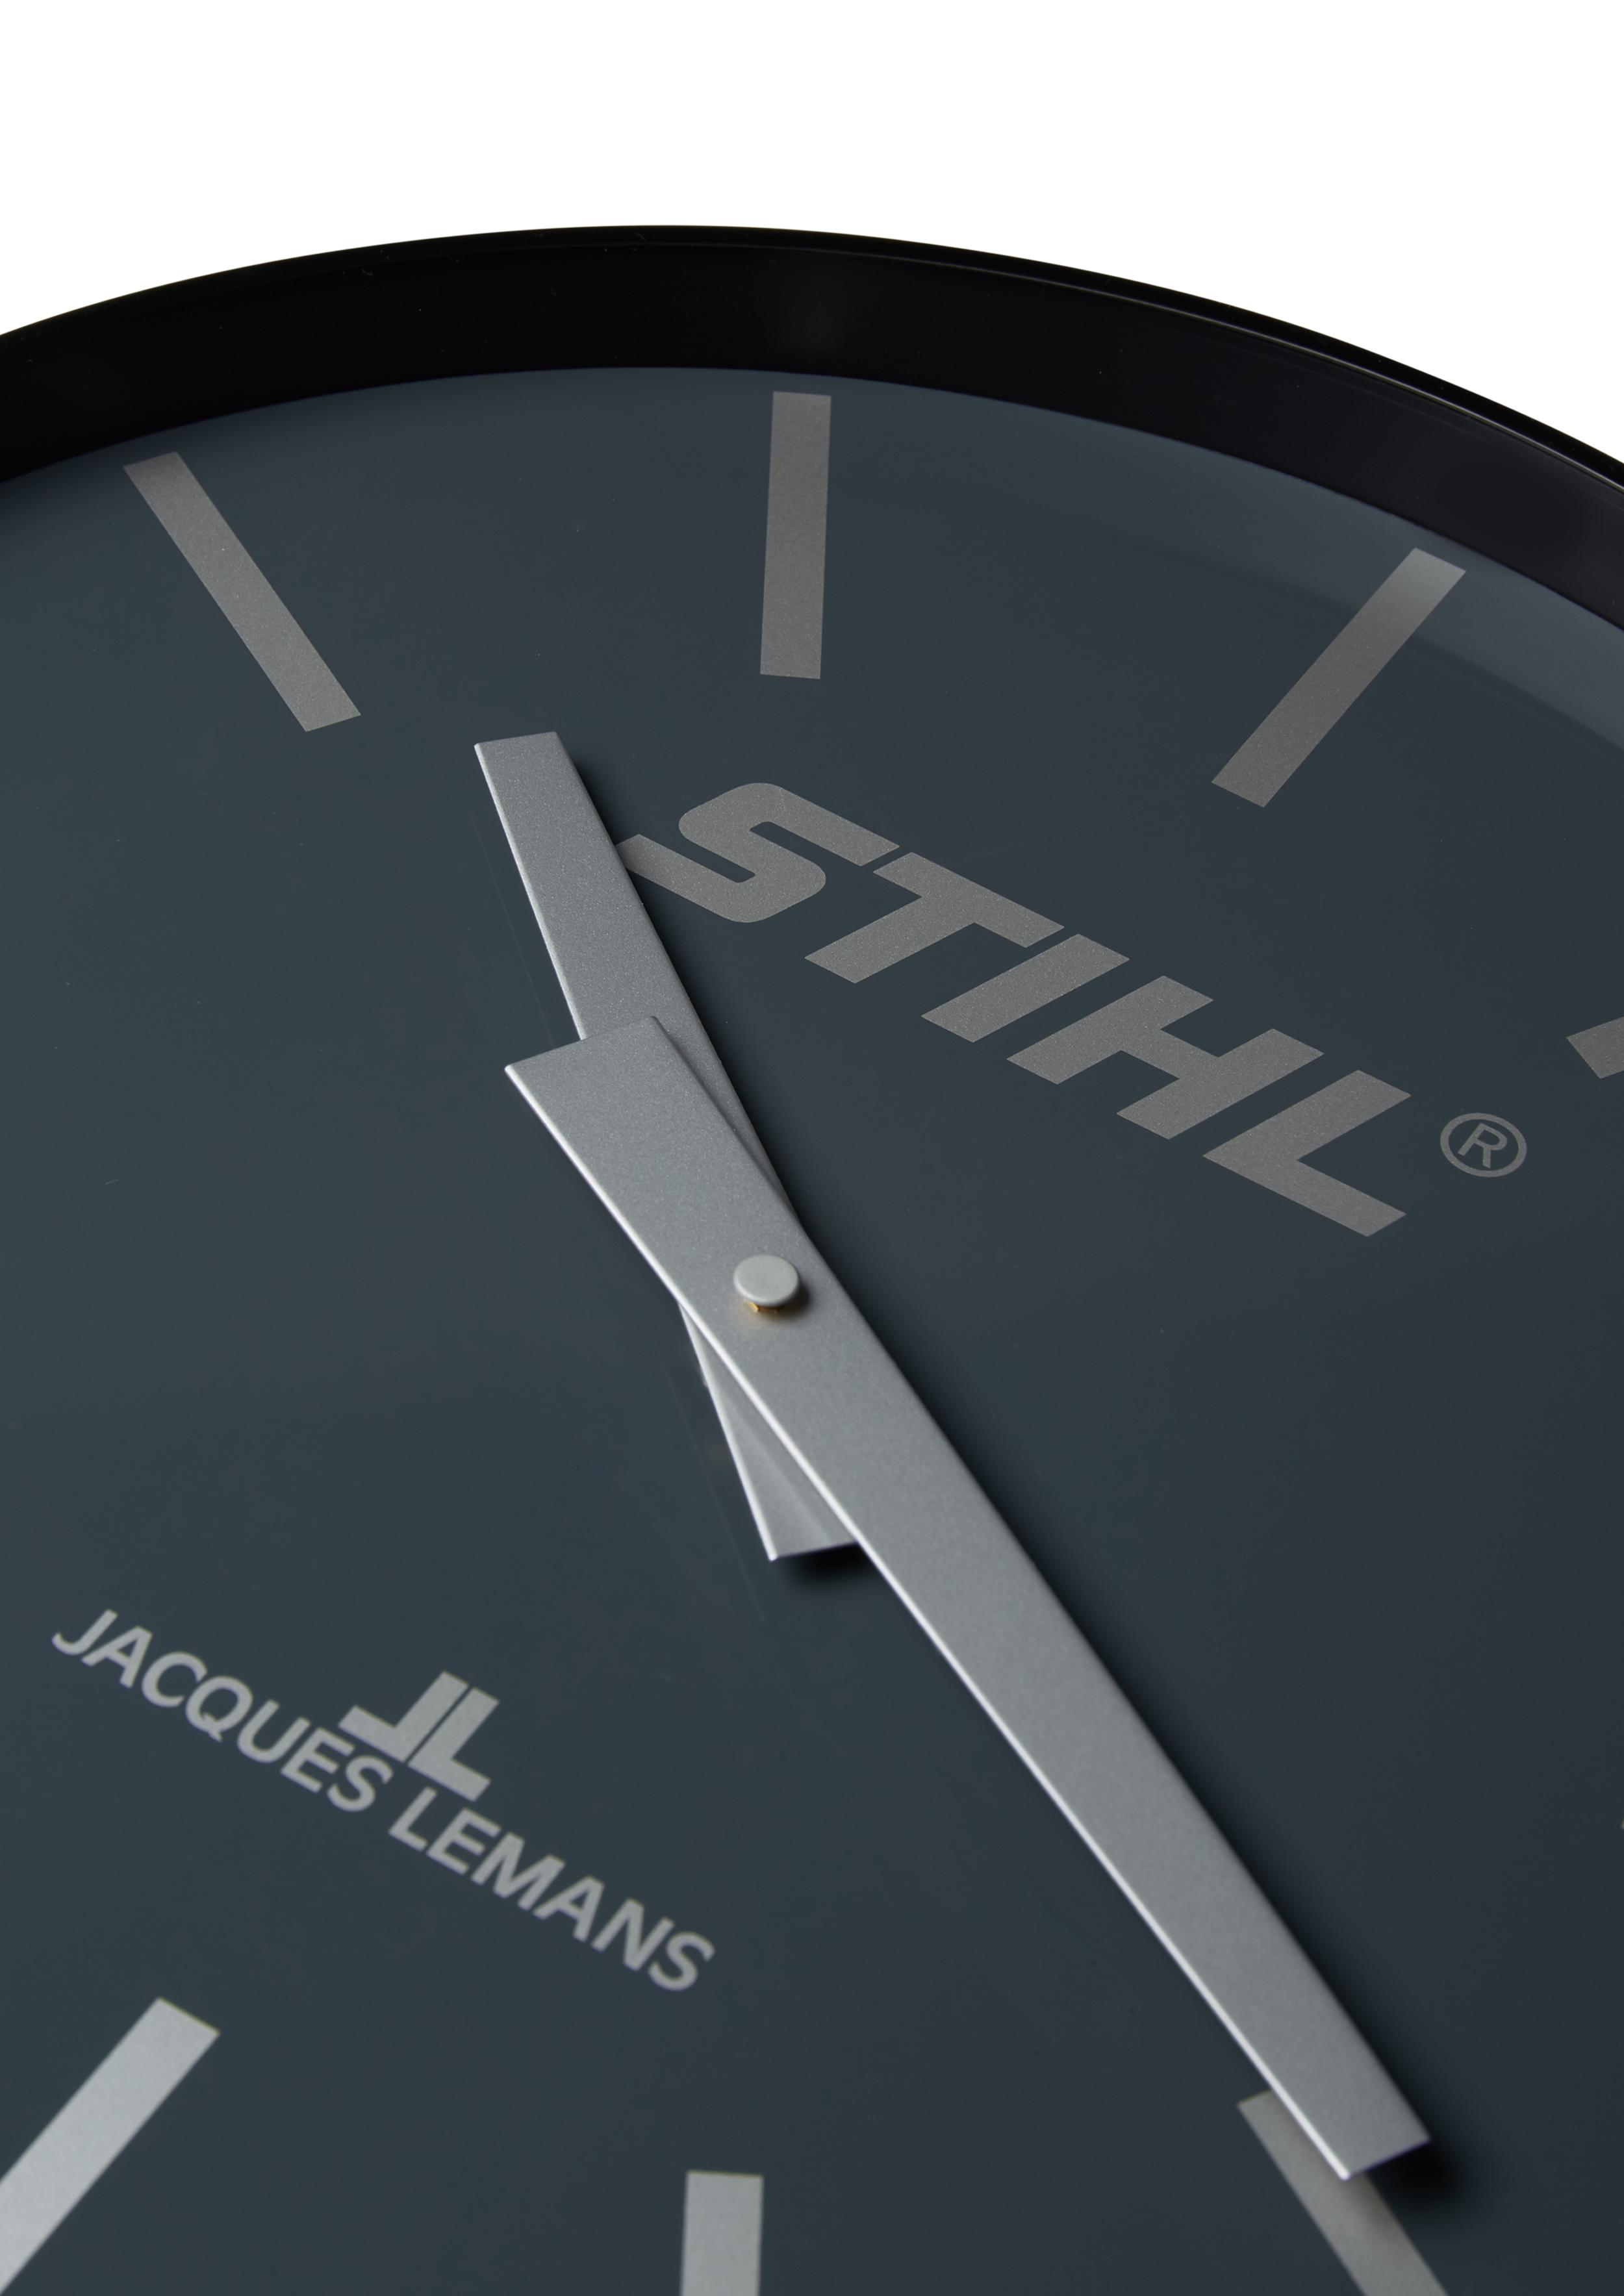 Stihl Timbersports Wanduhr Jacques LEMANS Quartz-Uhr Markenshop